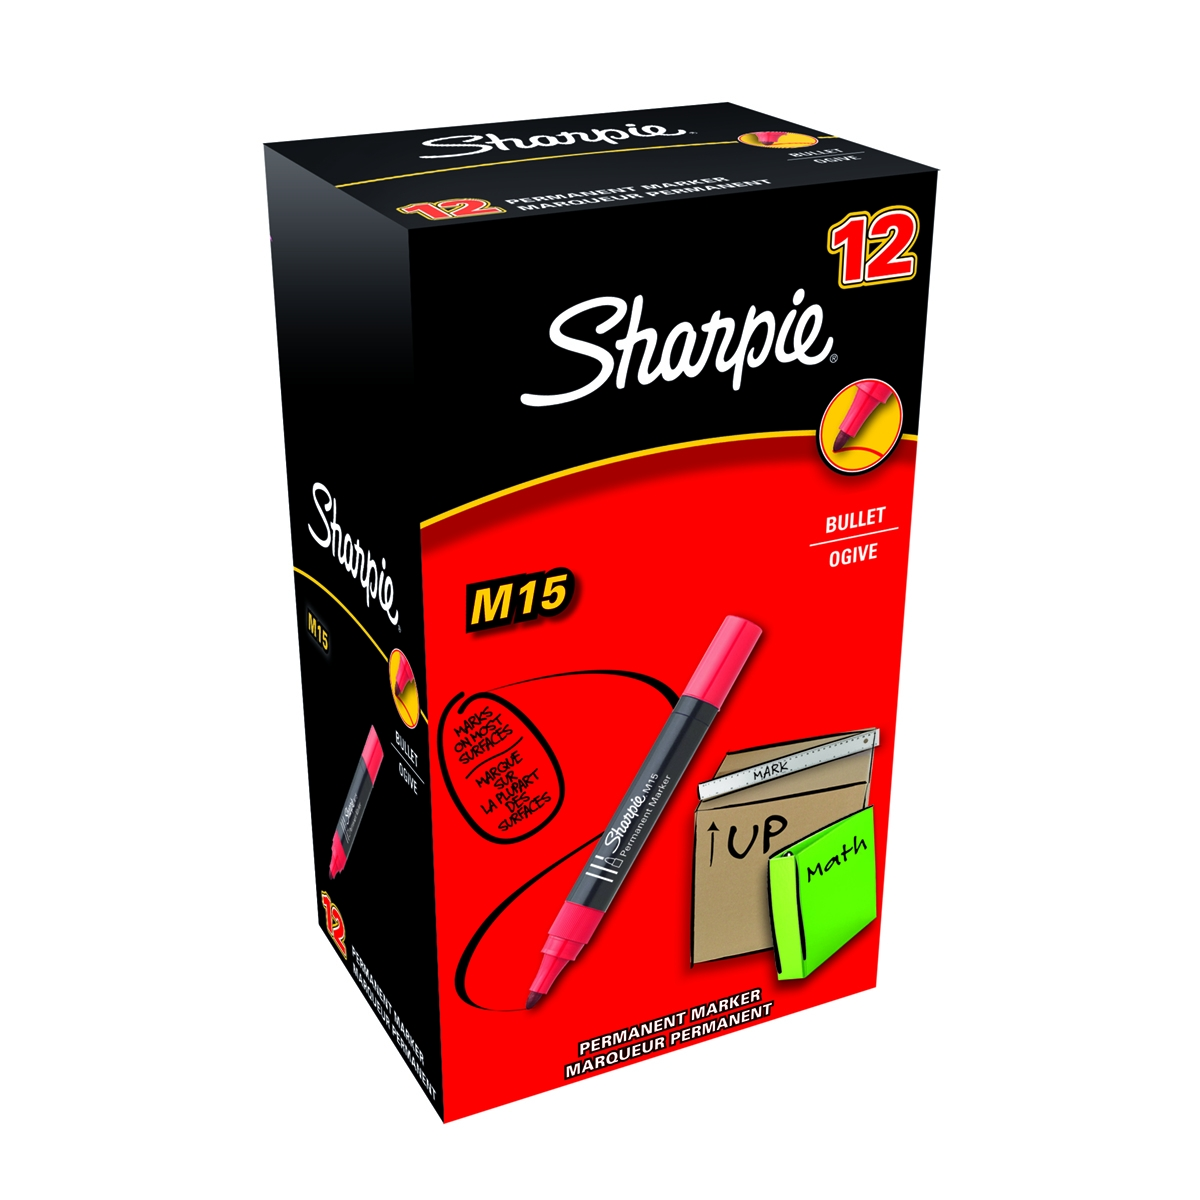 Sharpie permanent marker M15 rood - 12 stuks